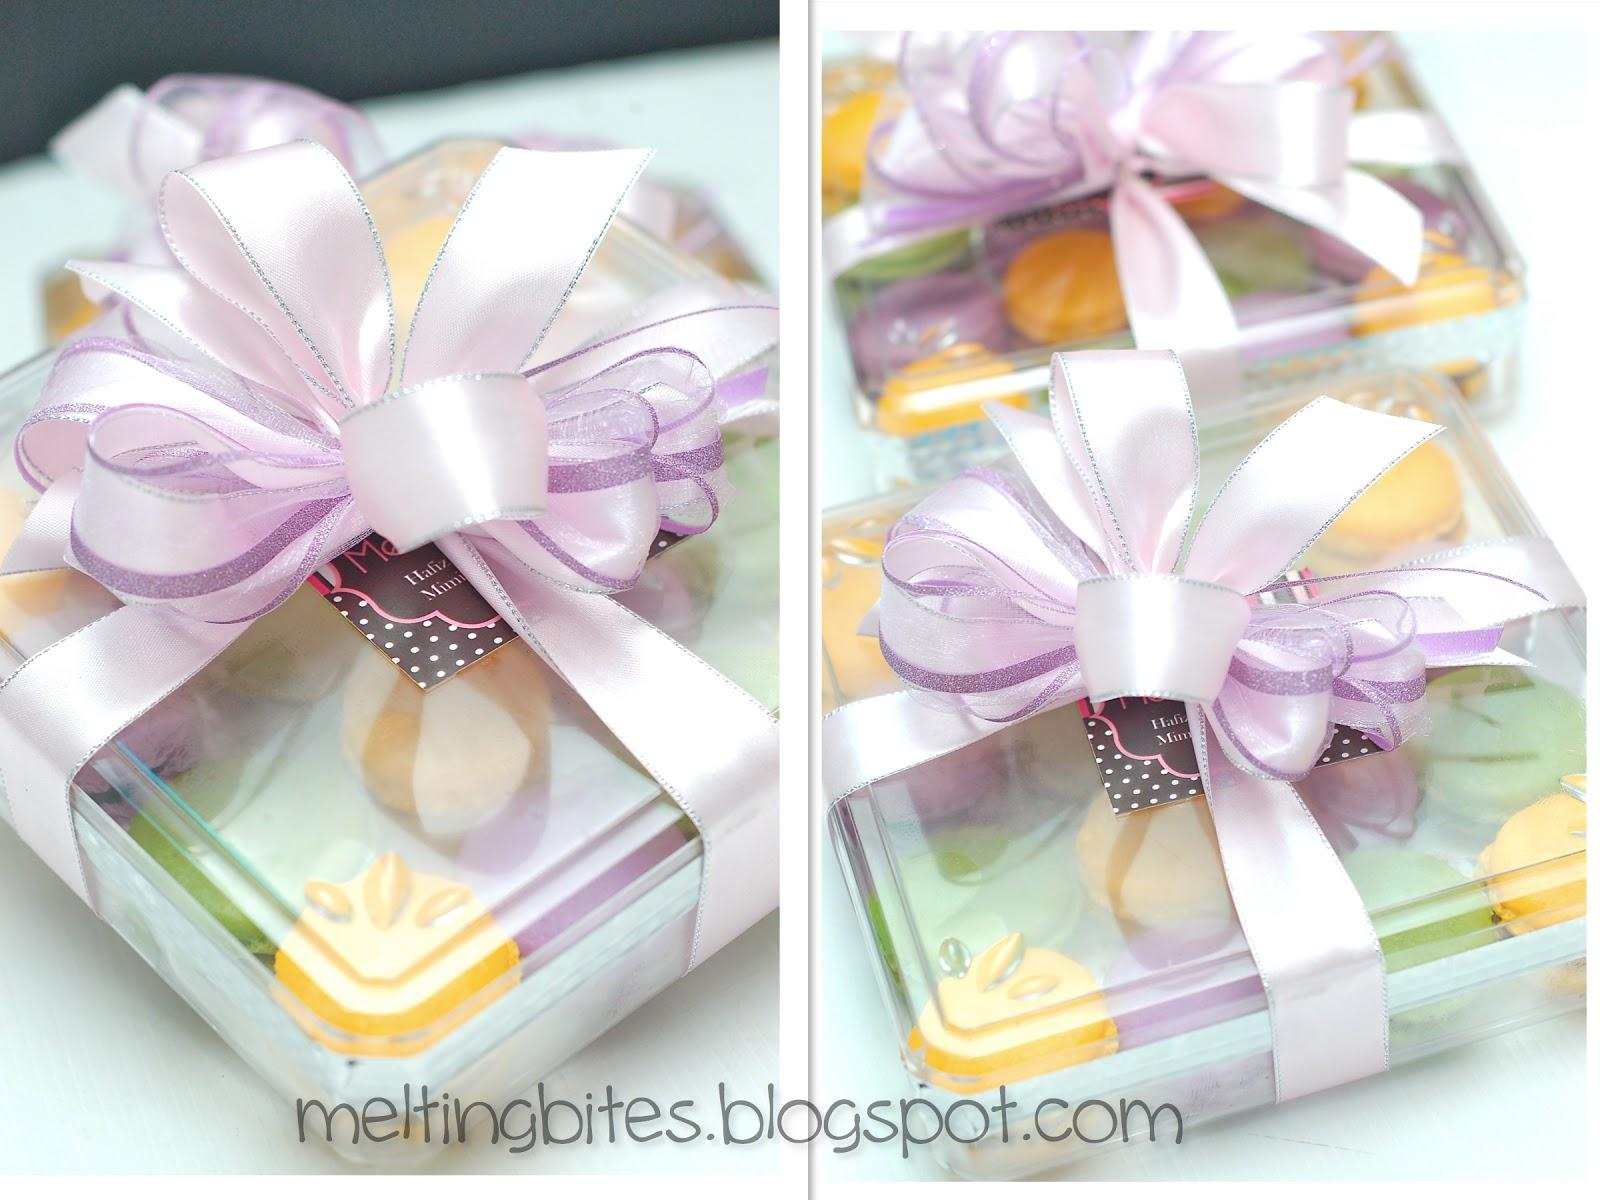 Melting Bites - Something Sweet By MeltingBites: Macarons for hantaran